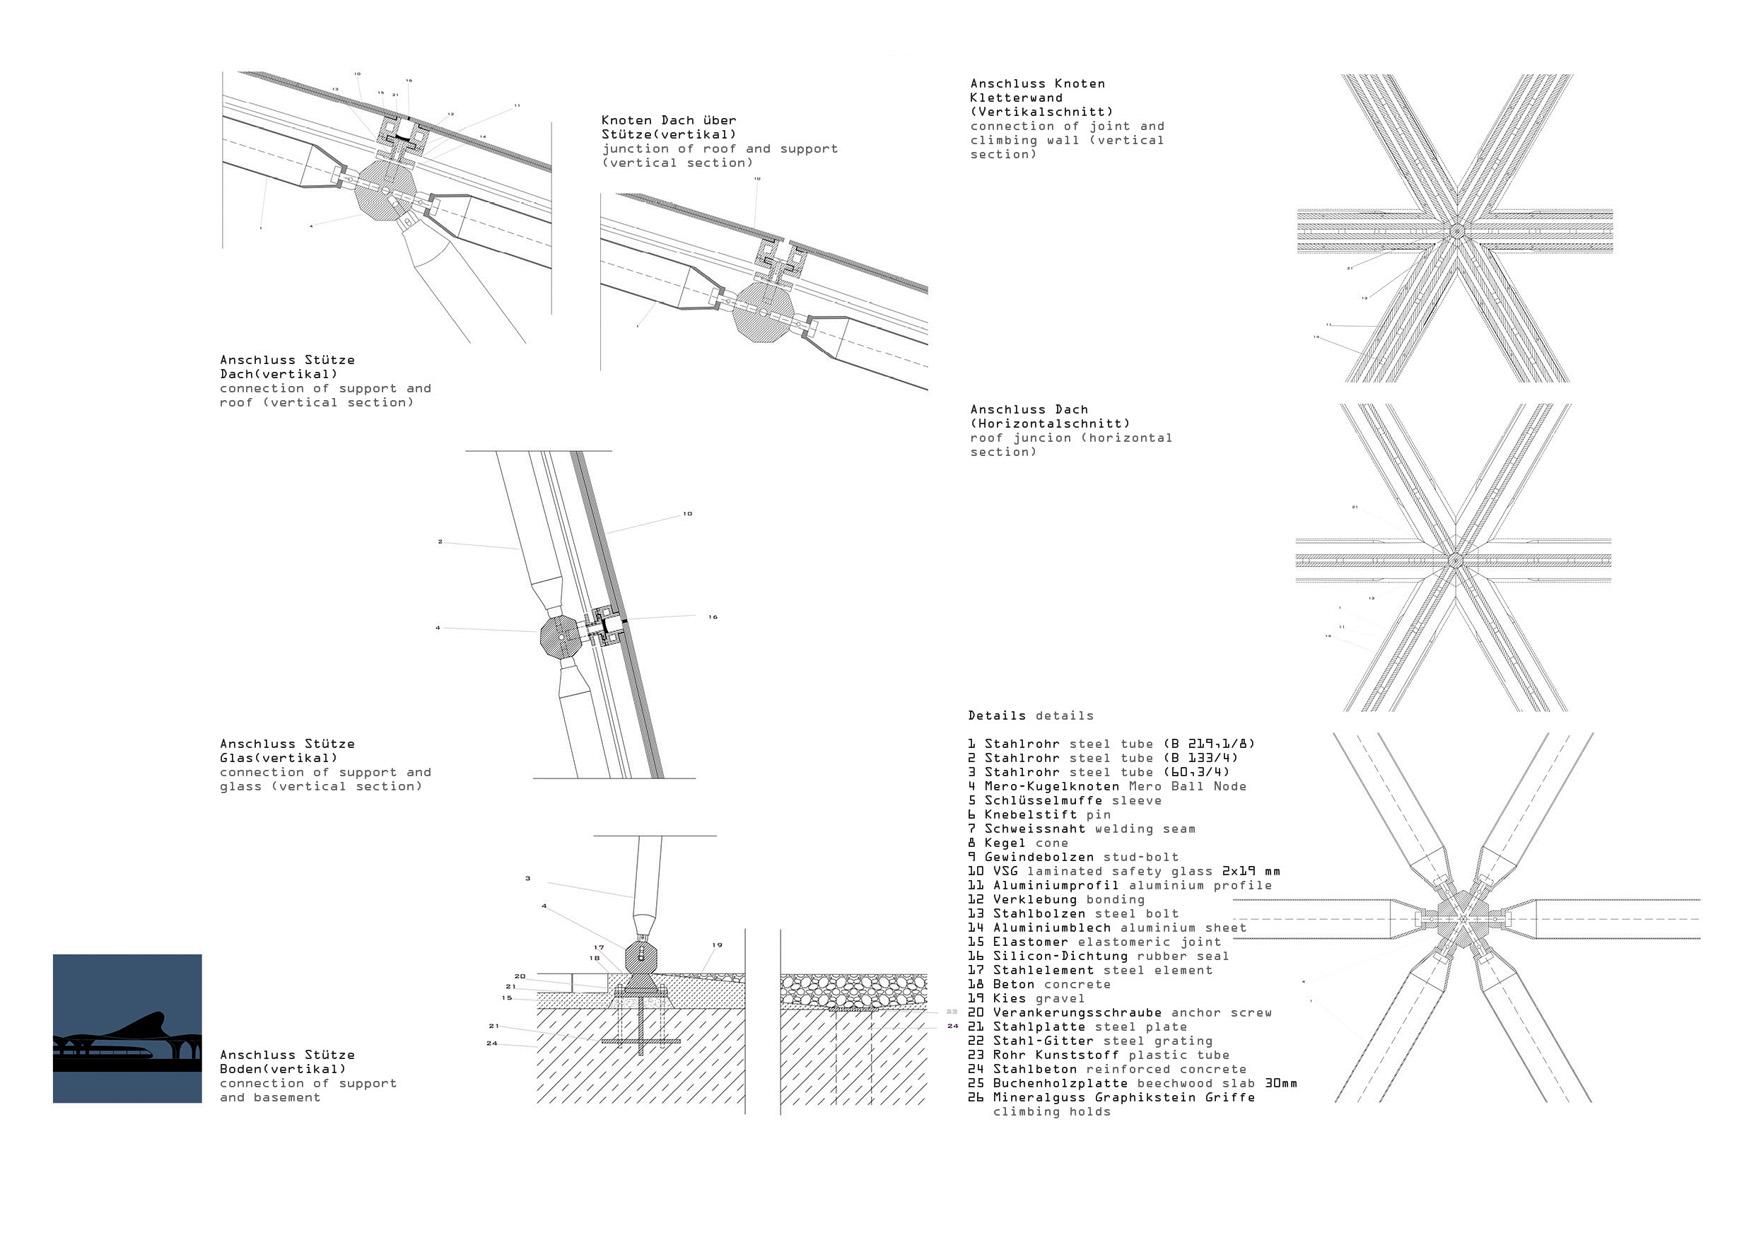 Charmant Drahtseil Stahl Anschluss Design Fotos - Der Schaltplan ...